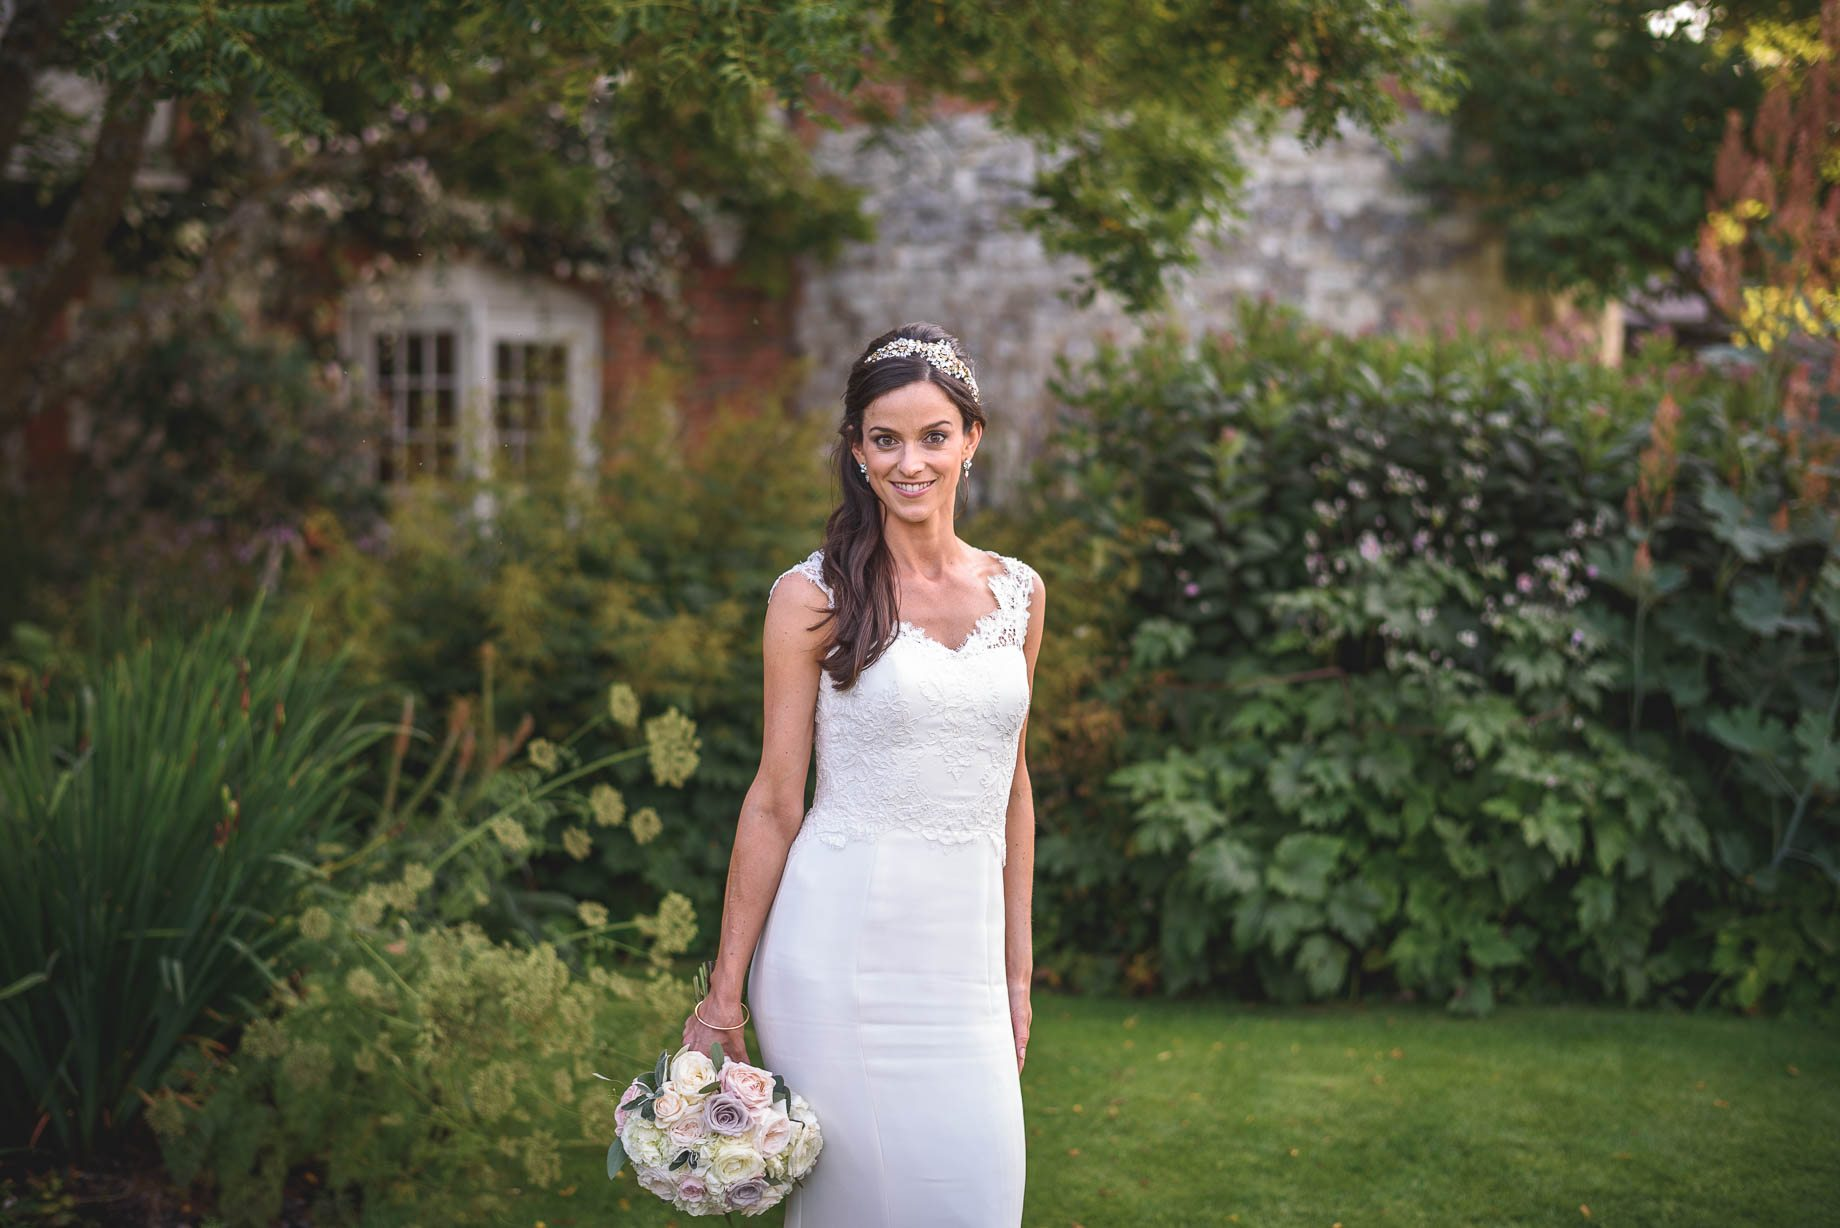 Bury Court Barn Wedding Photography - Caroline and Rob (163 of 219)